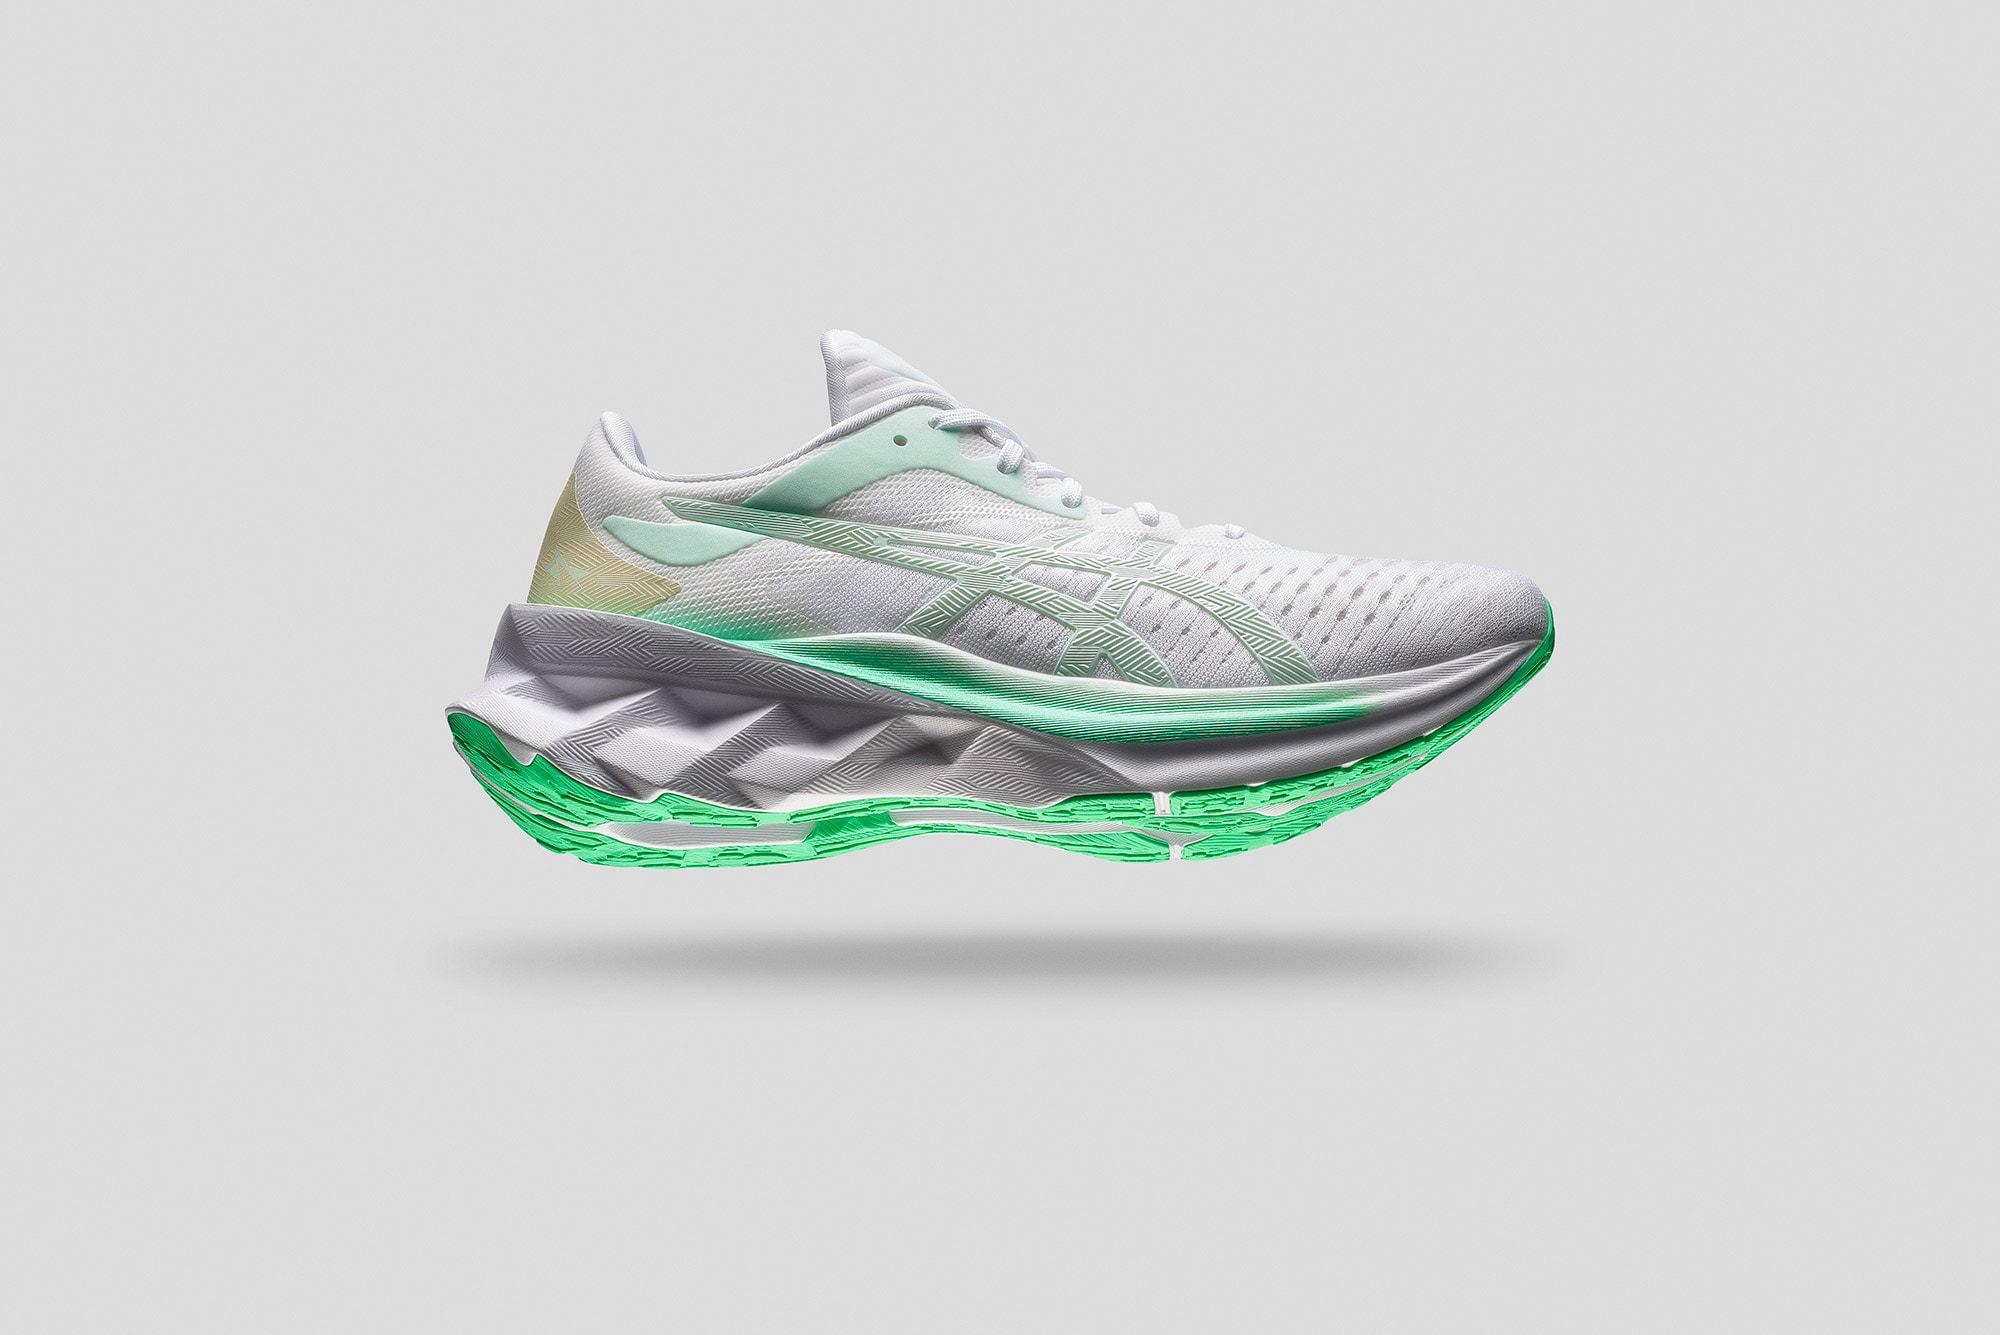 asics nova blast women's running shoe photos using the manfrotto product table and elinchrom lighting